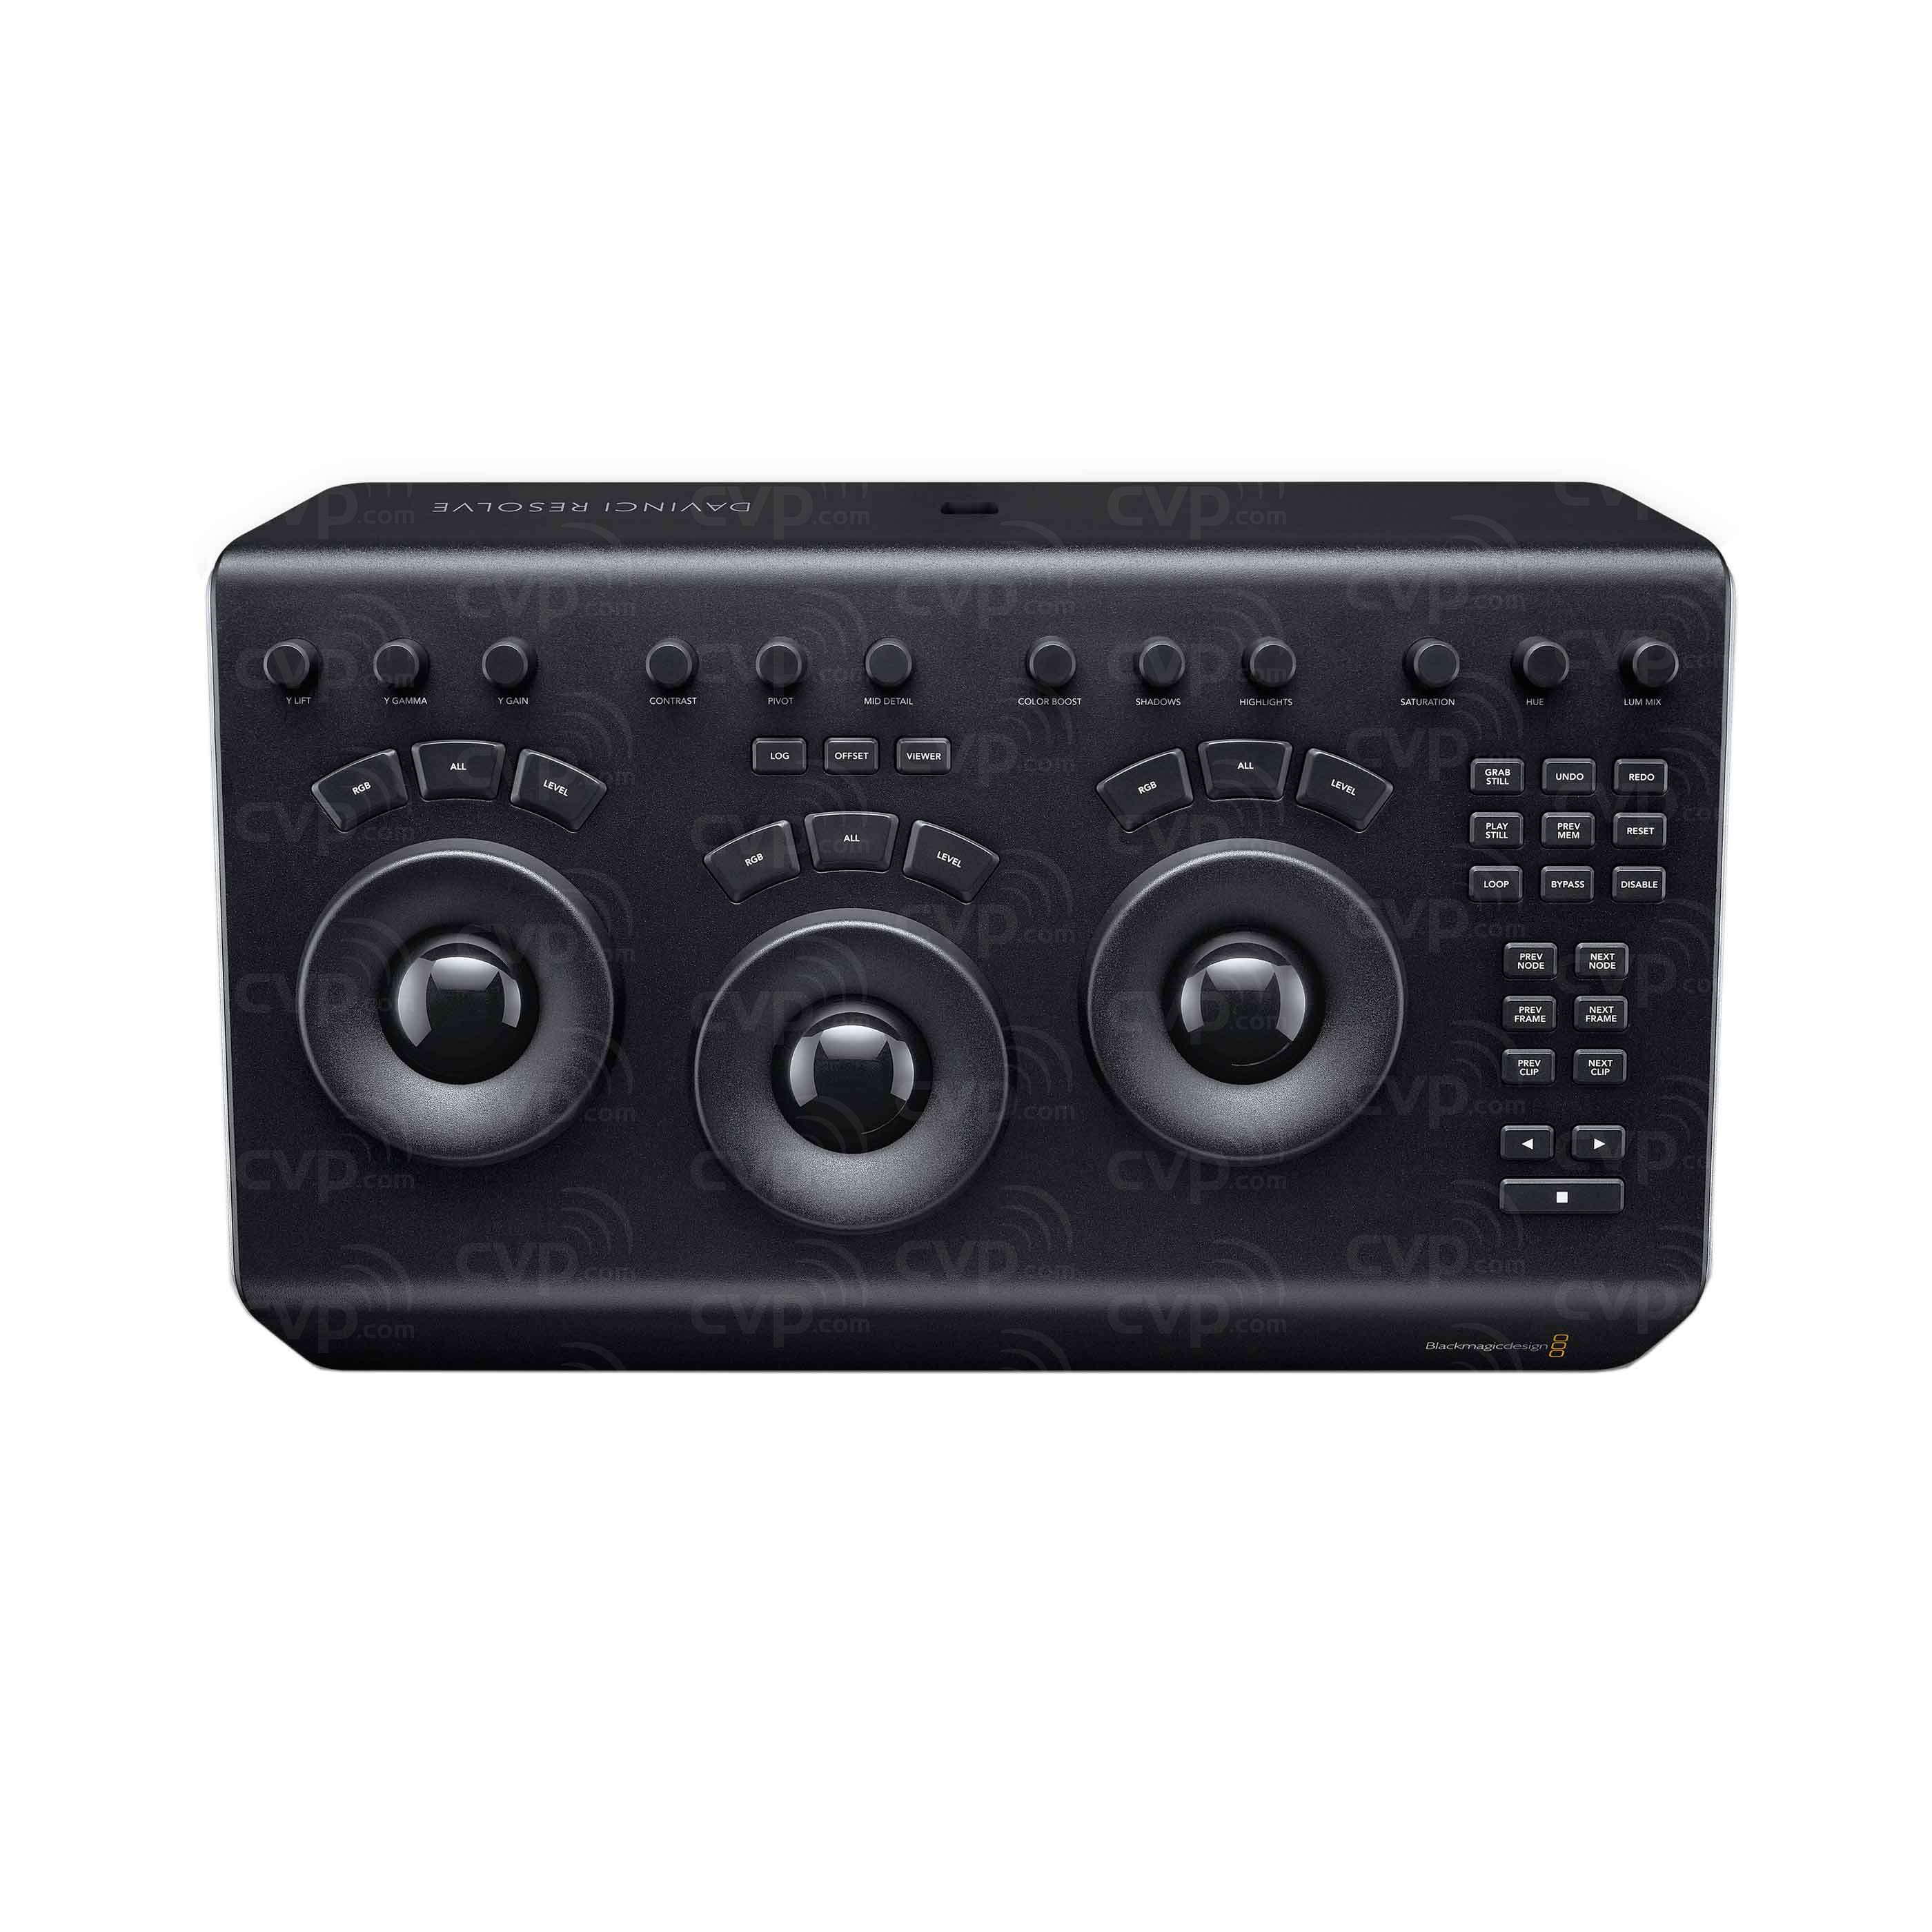 Blackmagic Design DaVinci Resolve Micro Control Panel (p/n BMD-DV/RES/BBPNLMIC)